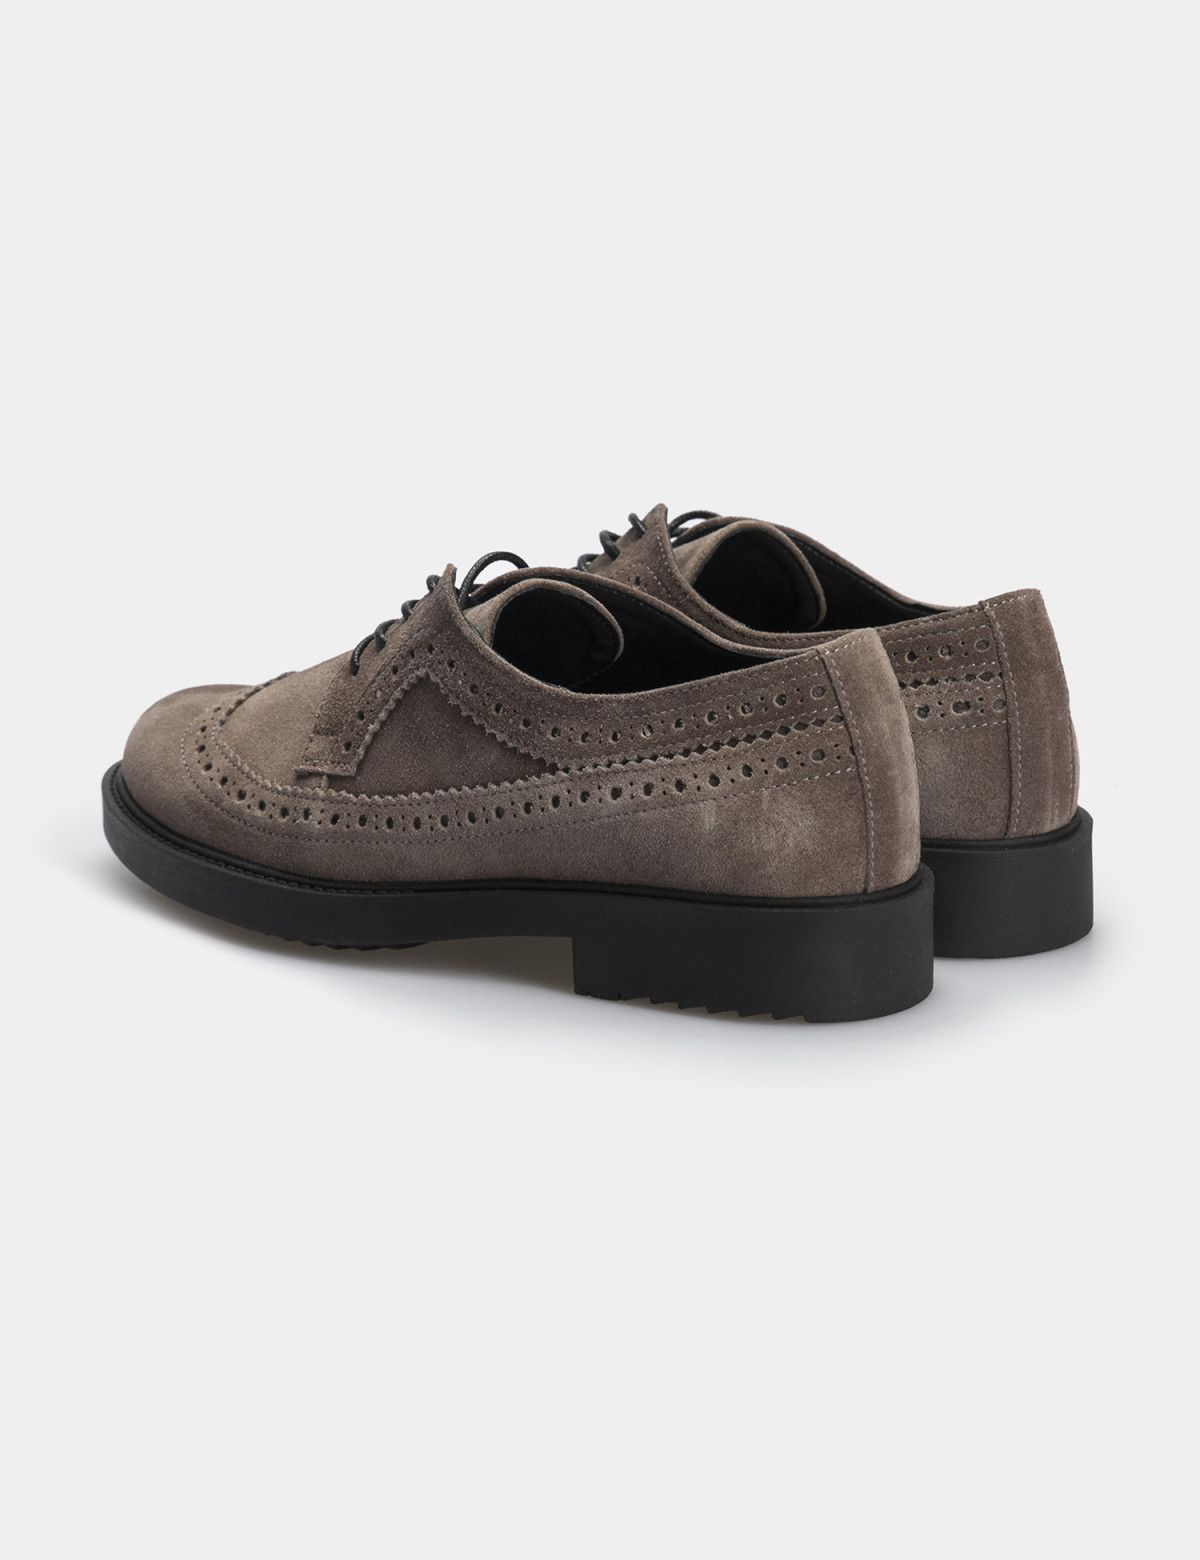 Туфлі темно-бежеві, натуральна замша2